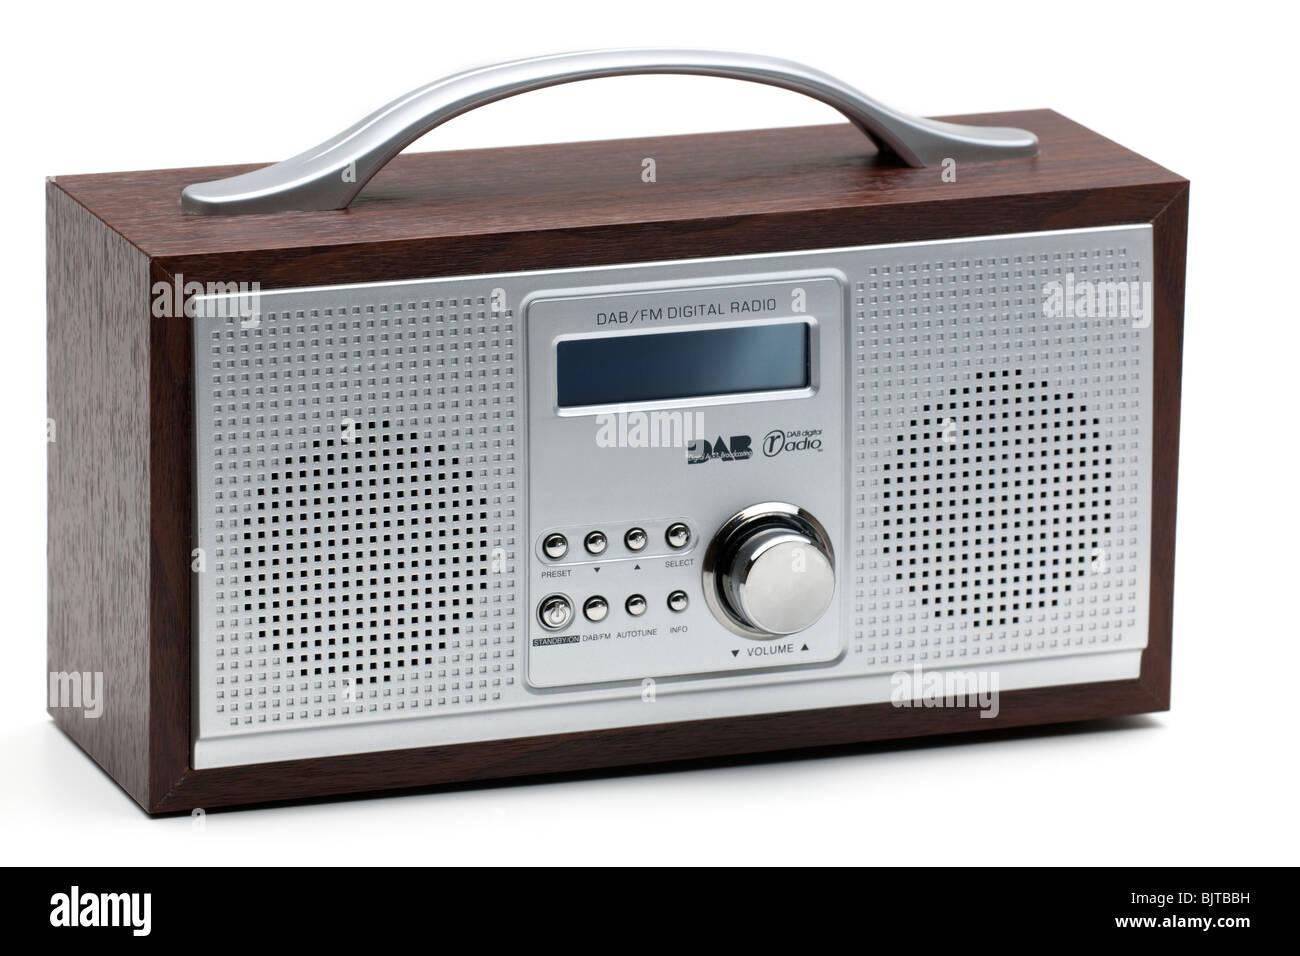 DAB-UKW-Digitalradio-Empfänger Stockbild